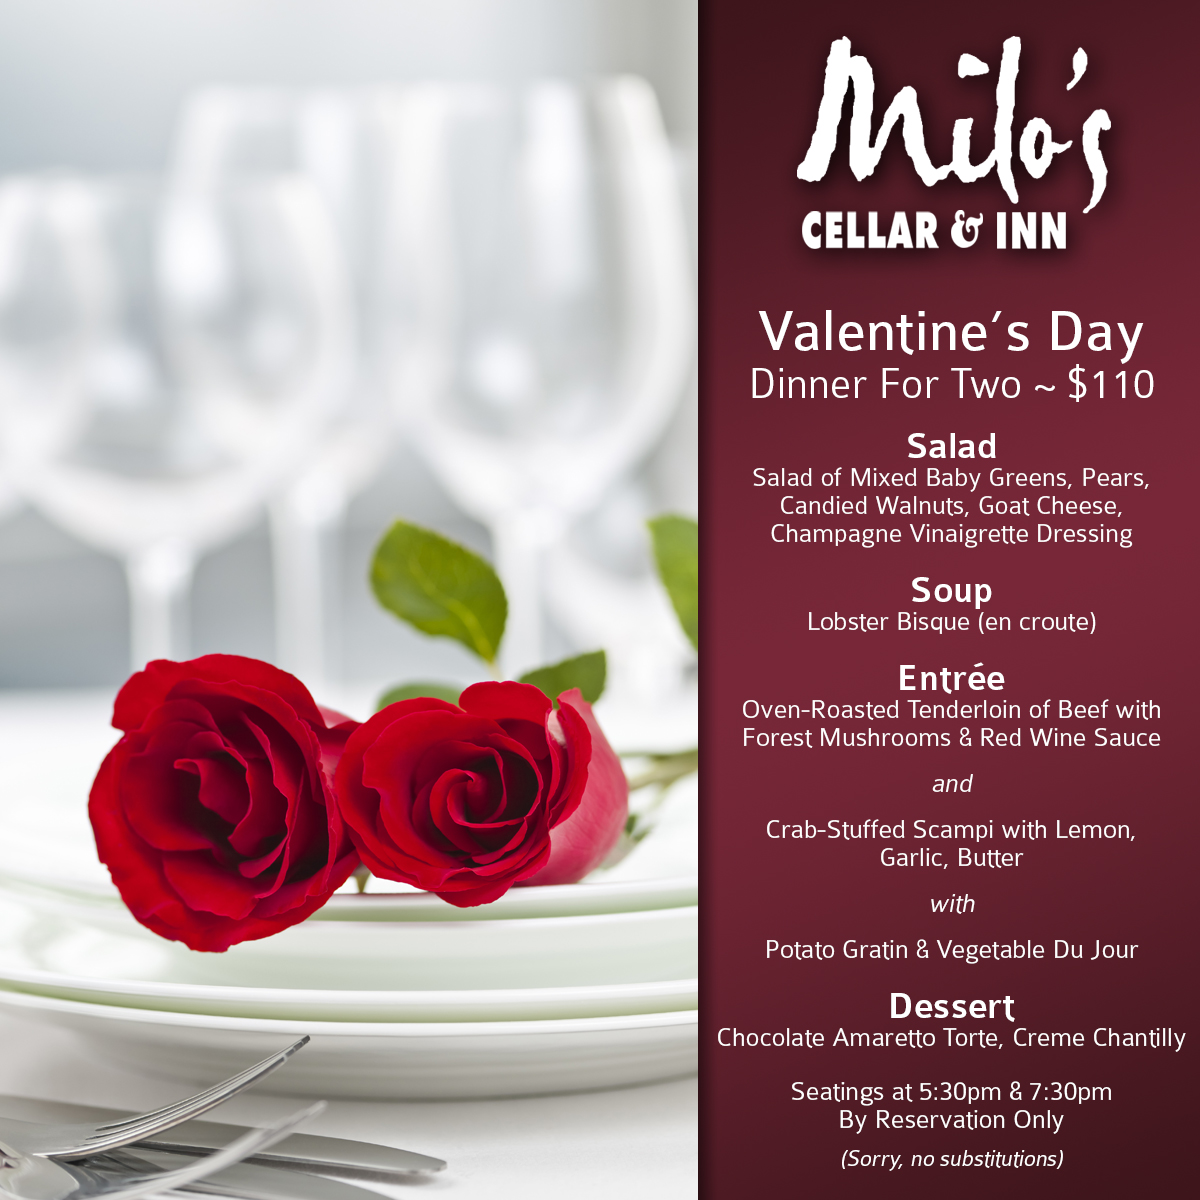 Milos Valentines Day Menu 2018 Boulder City, NV